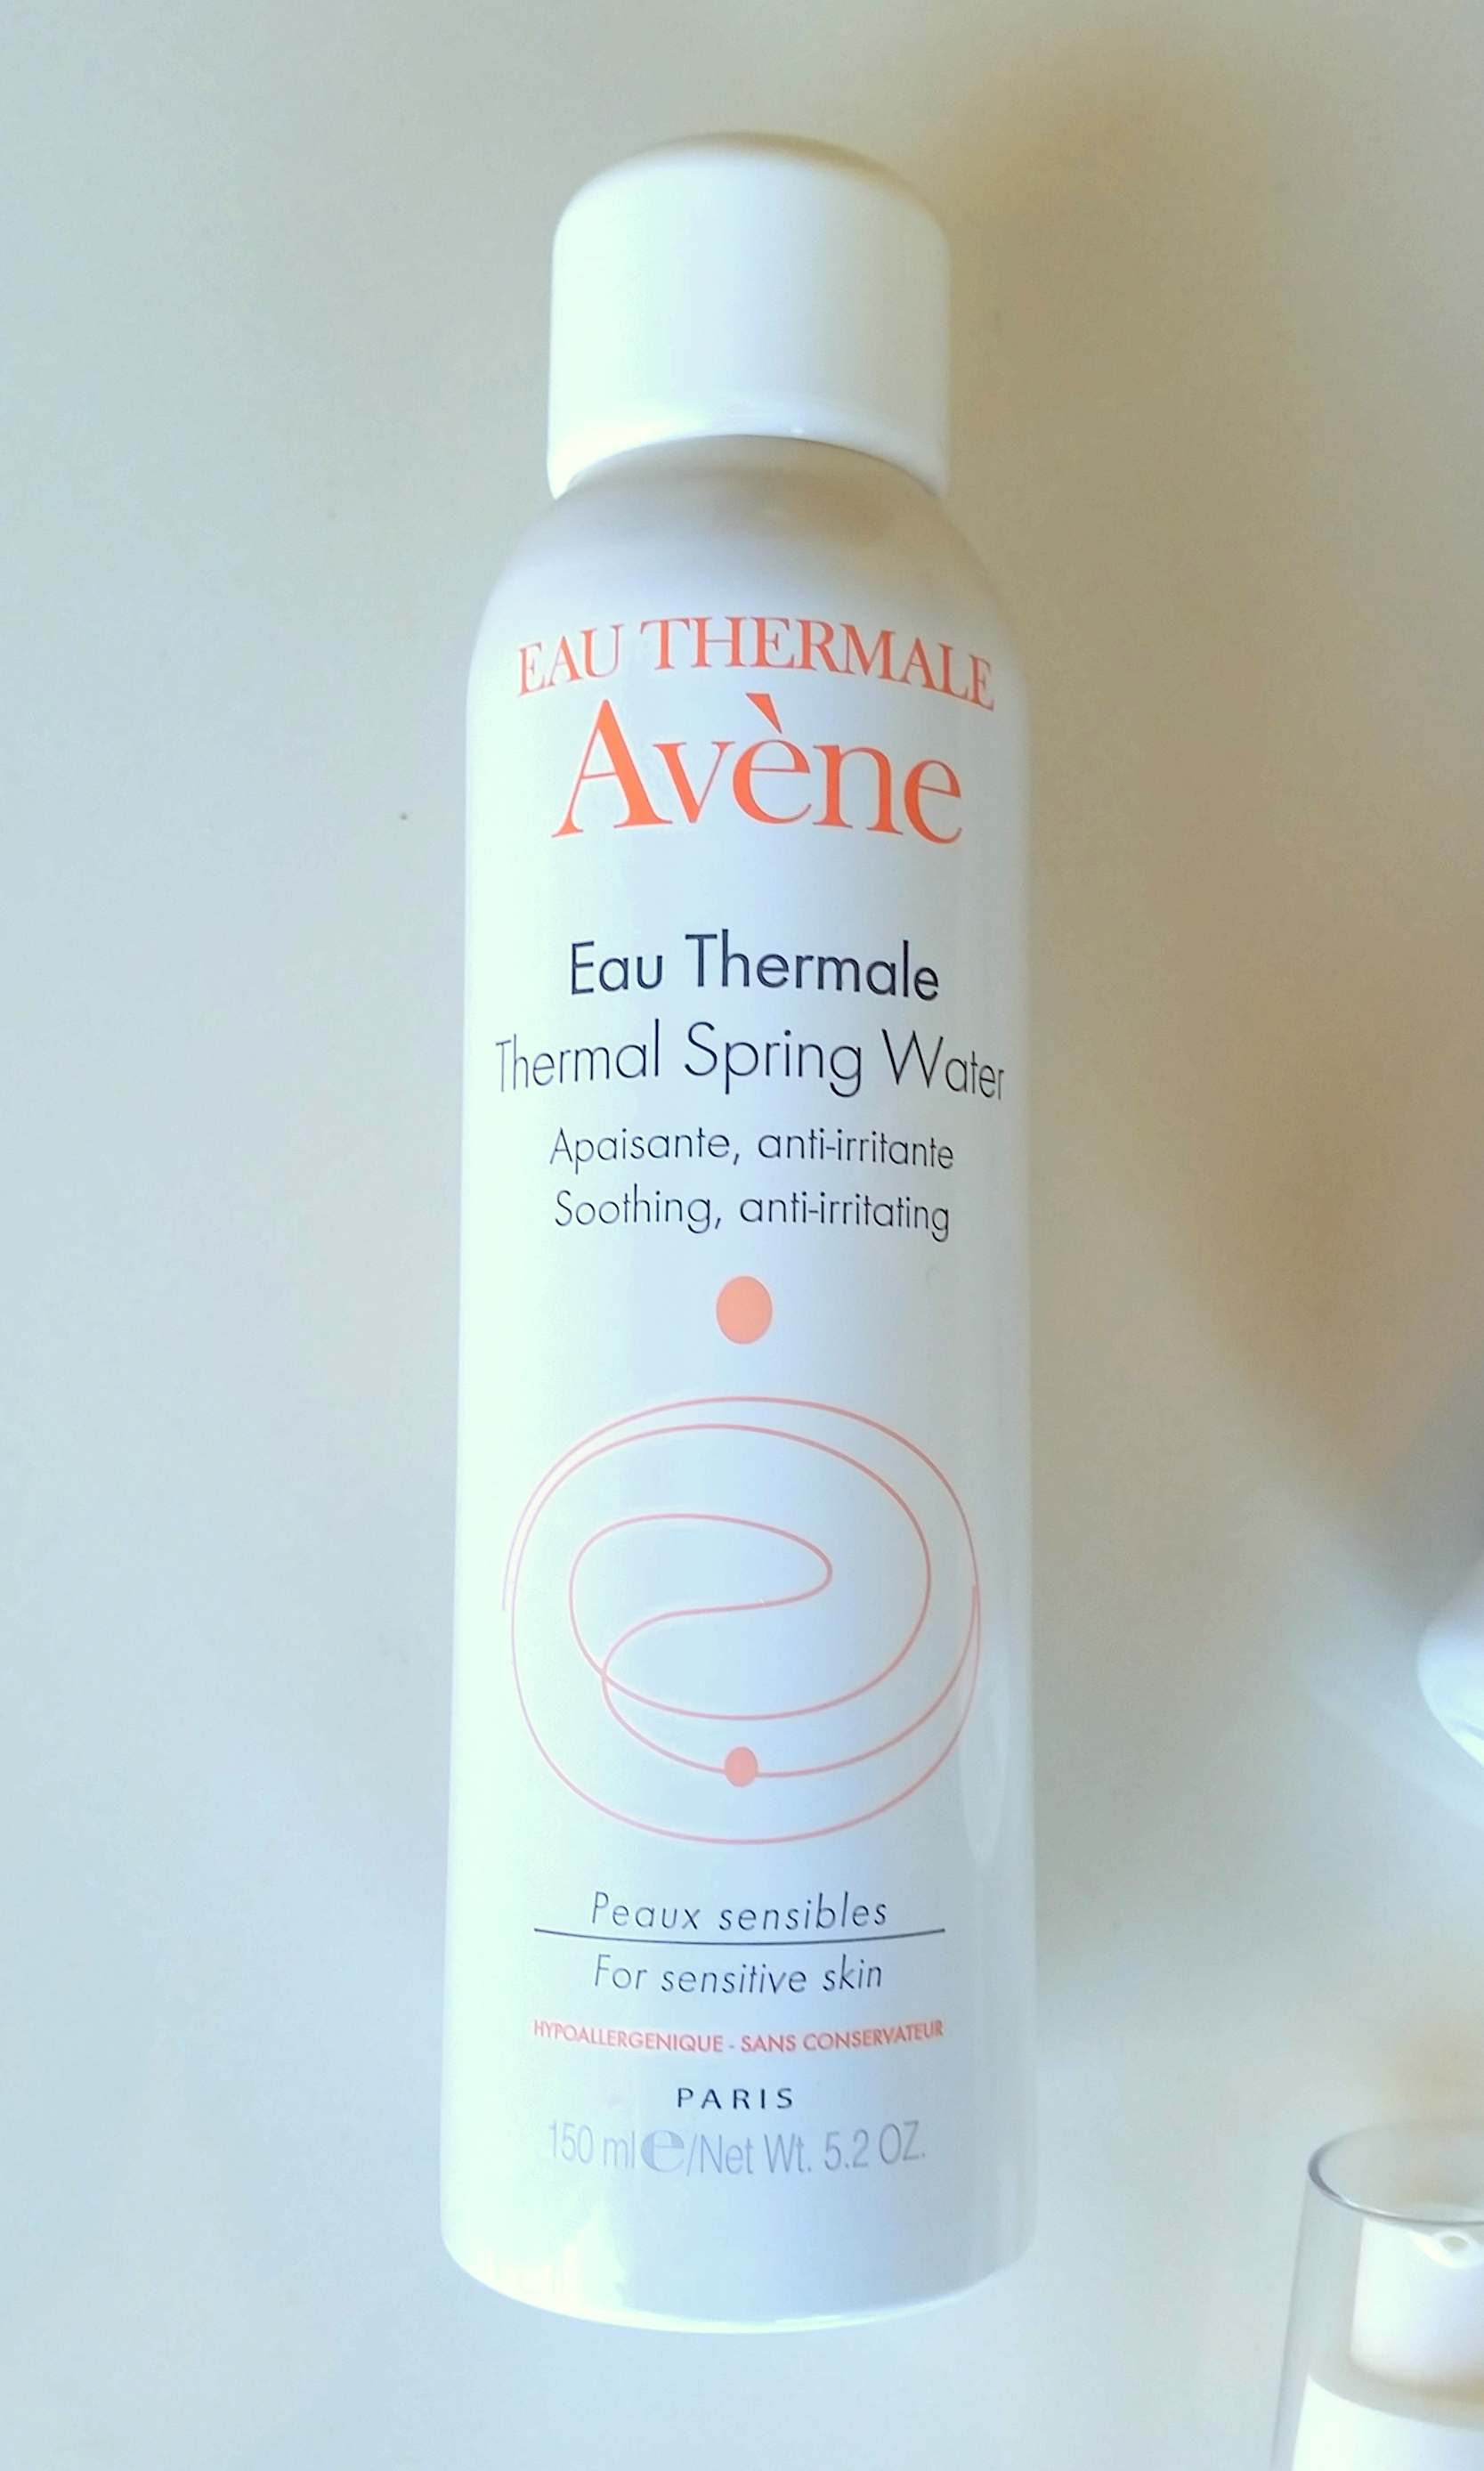 BRAND SPOTLIGHT: Avène Eau Thermale skincare, Sugar & Spice